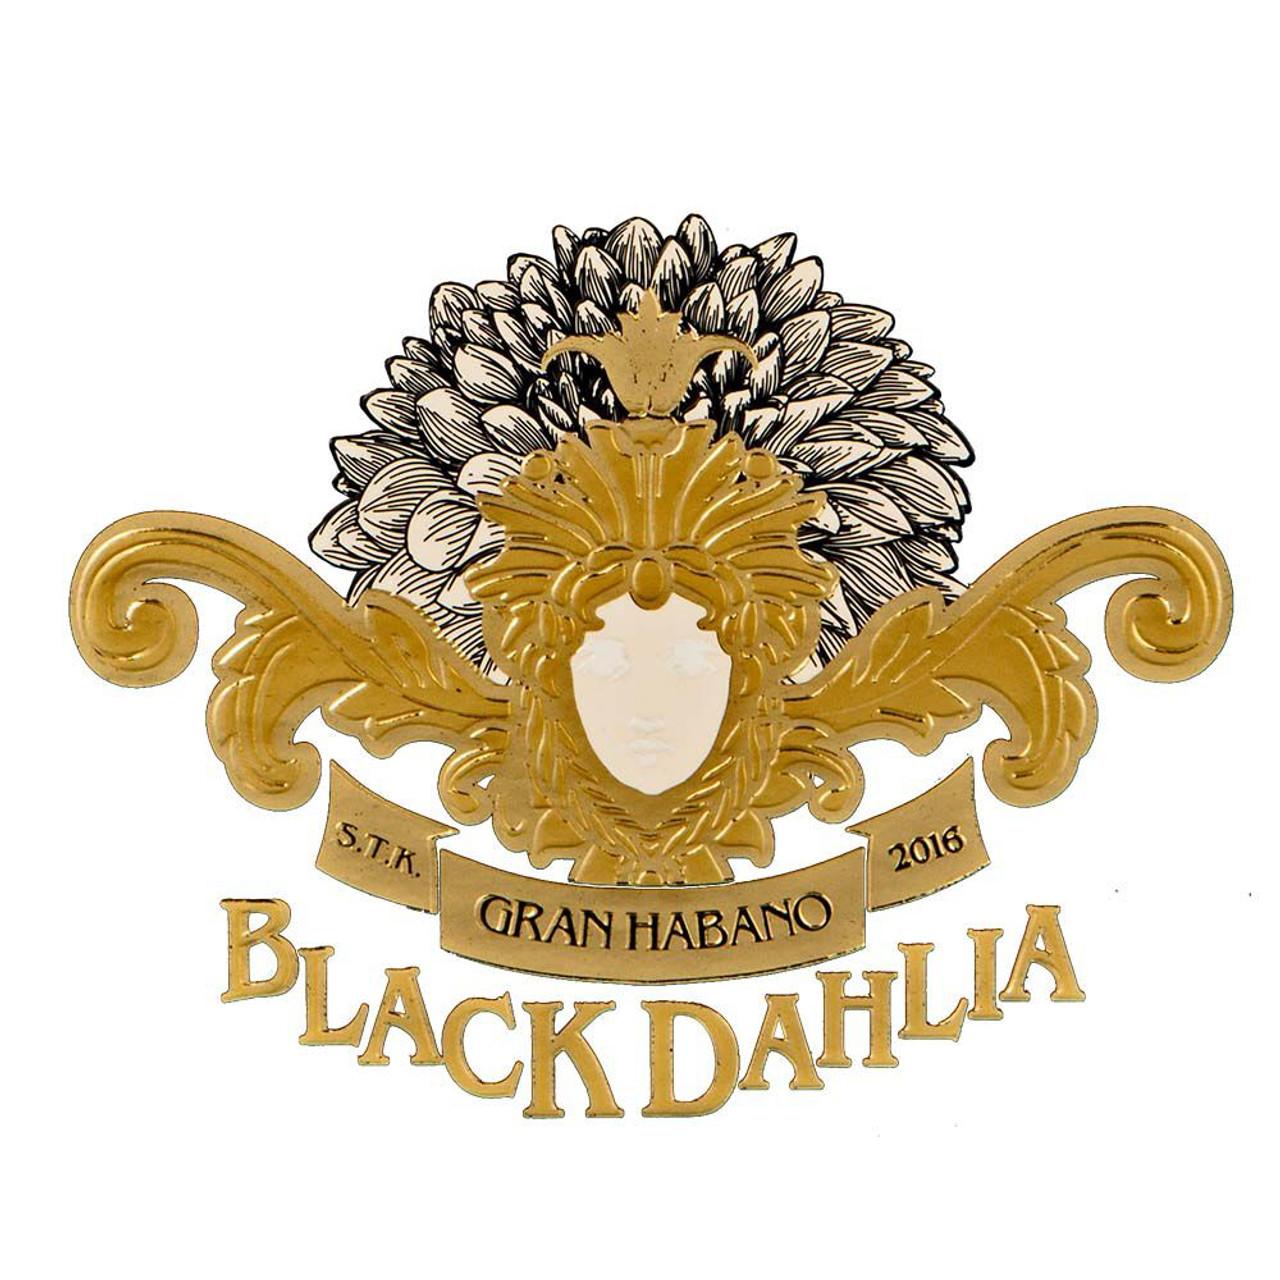 Black Dahlia by George Rico Corona Gorda Cigars - 5.63 x 46 (Box of 20)